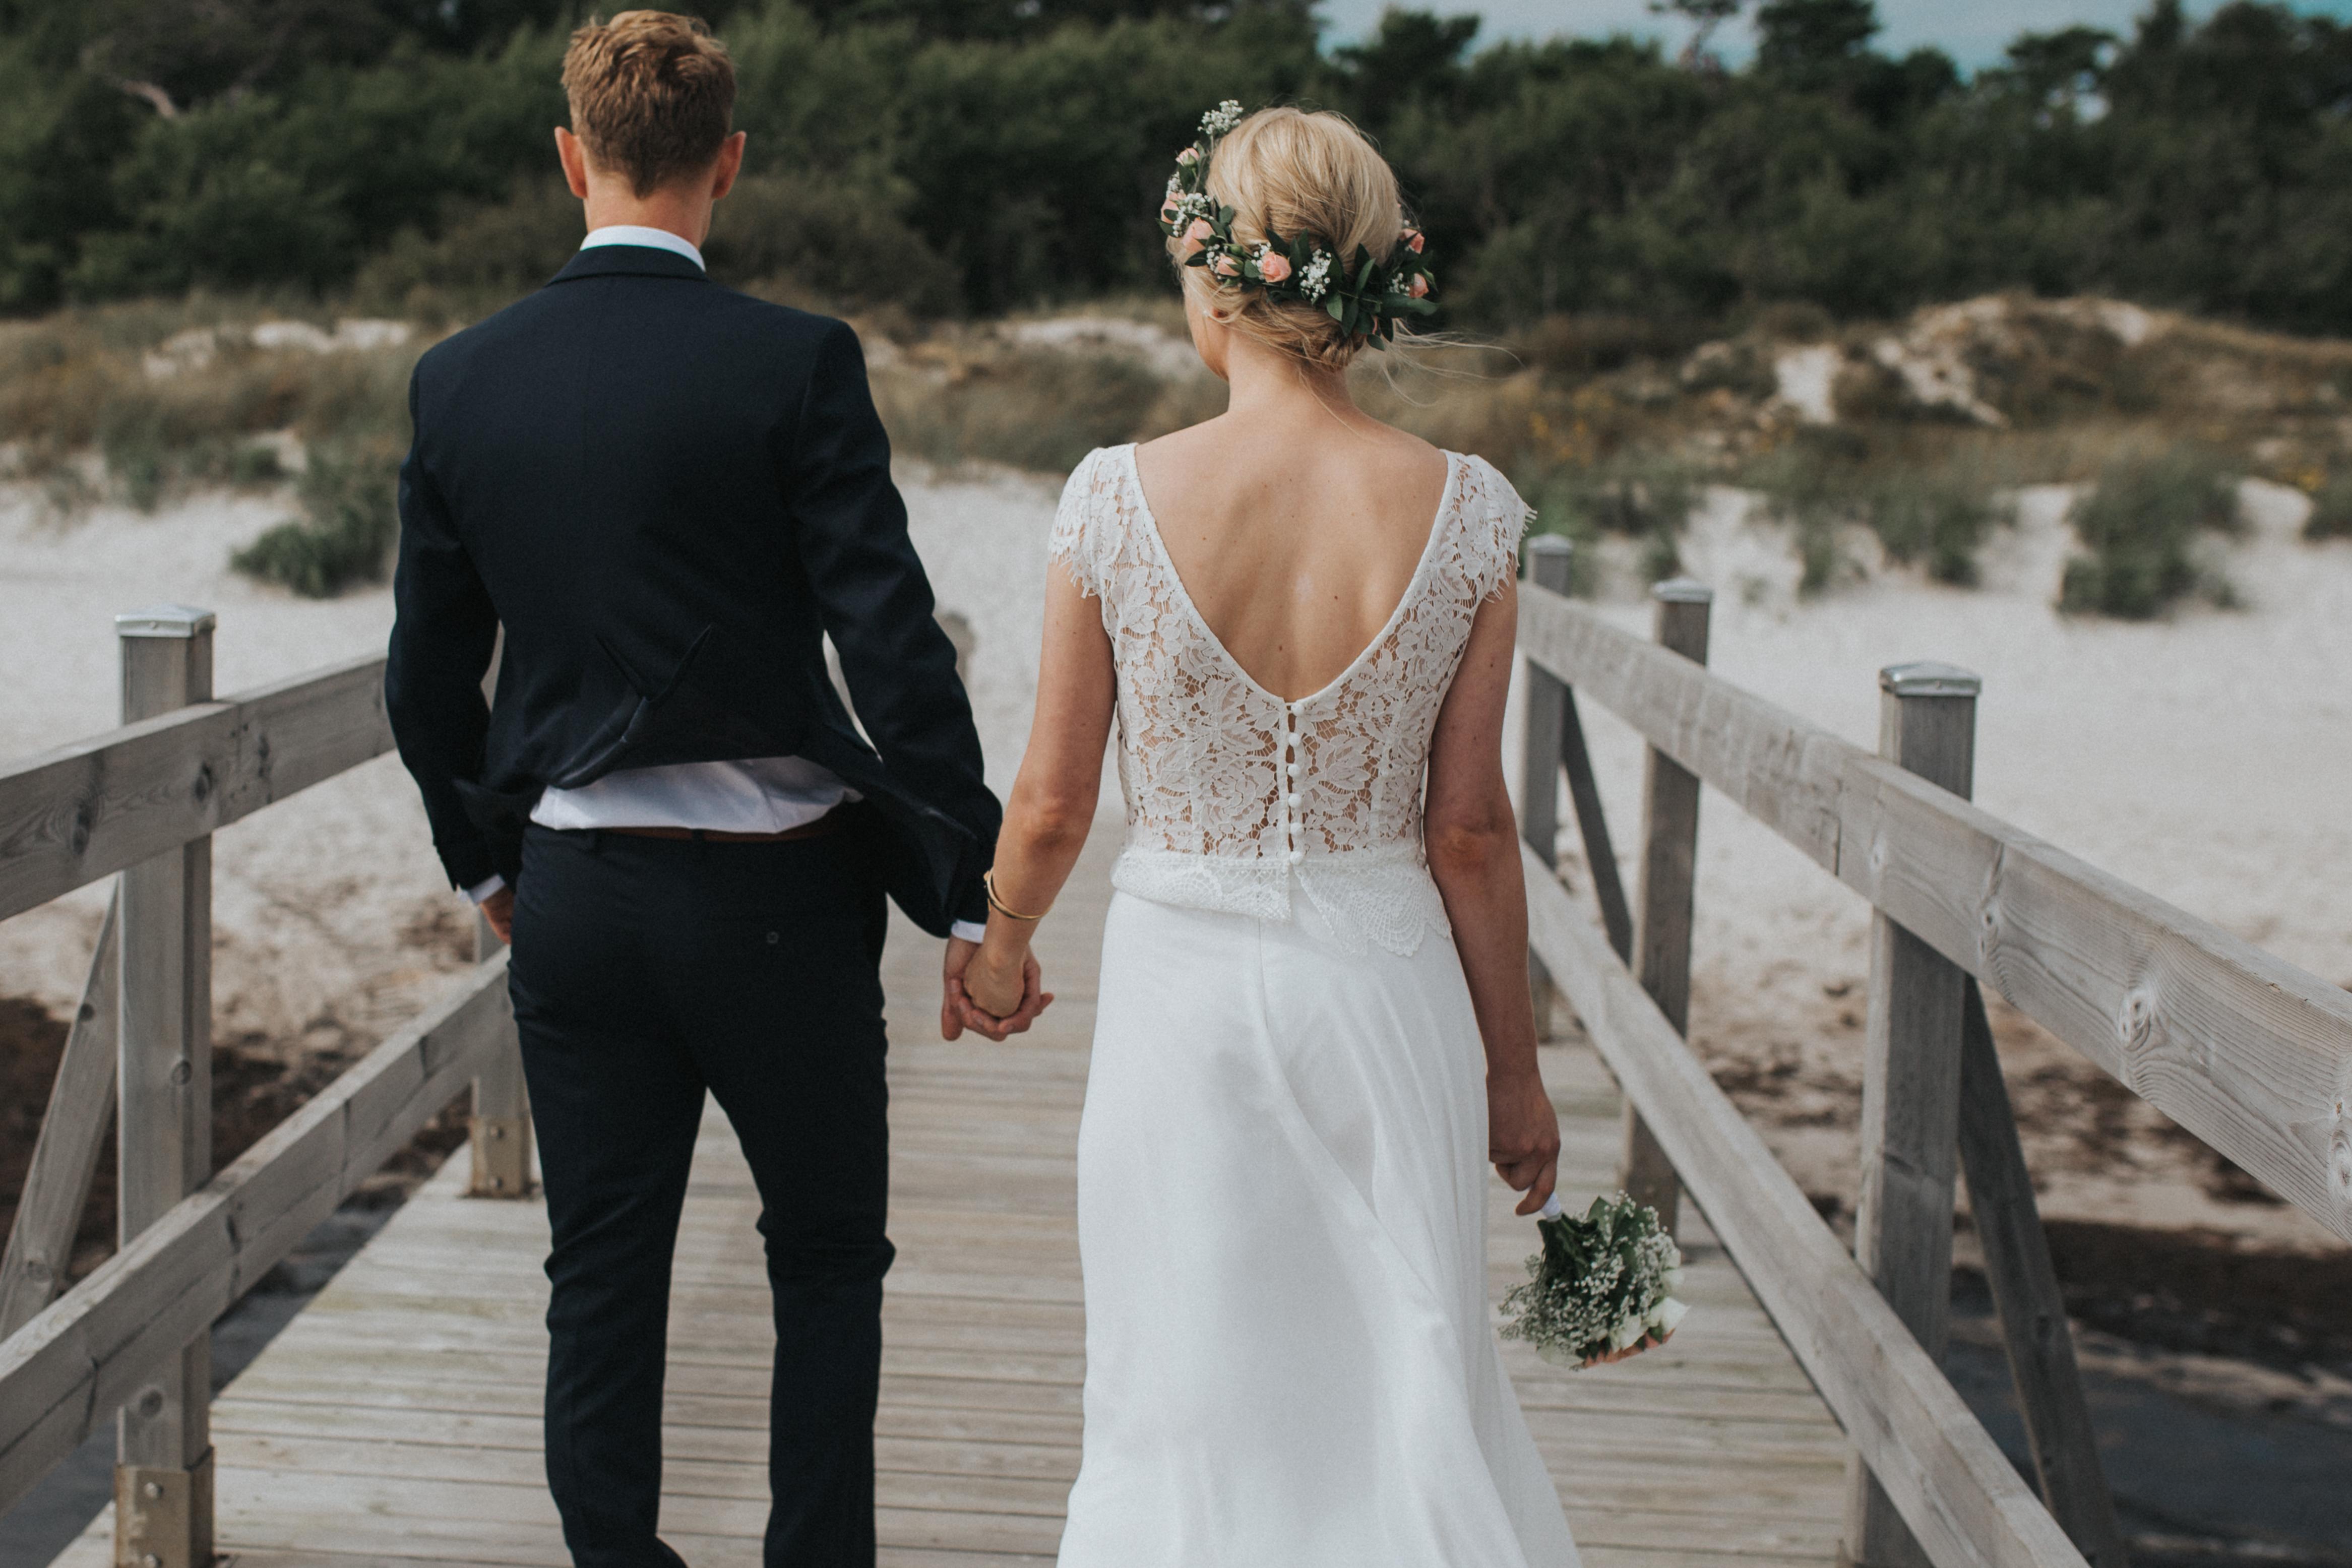 Bröllop-9854